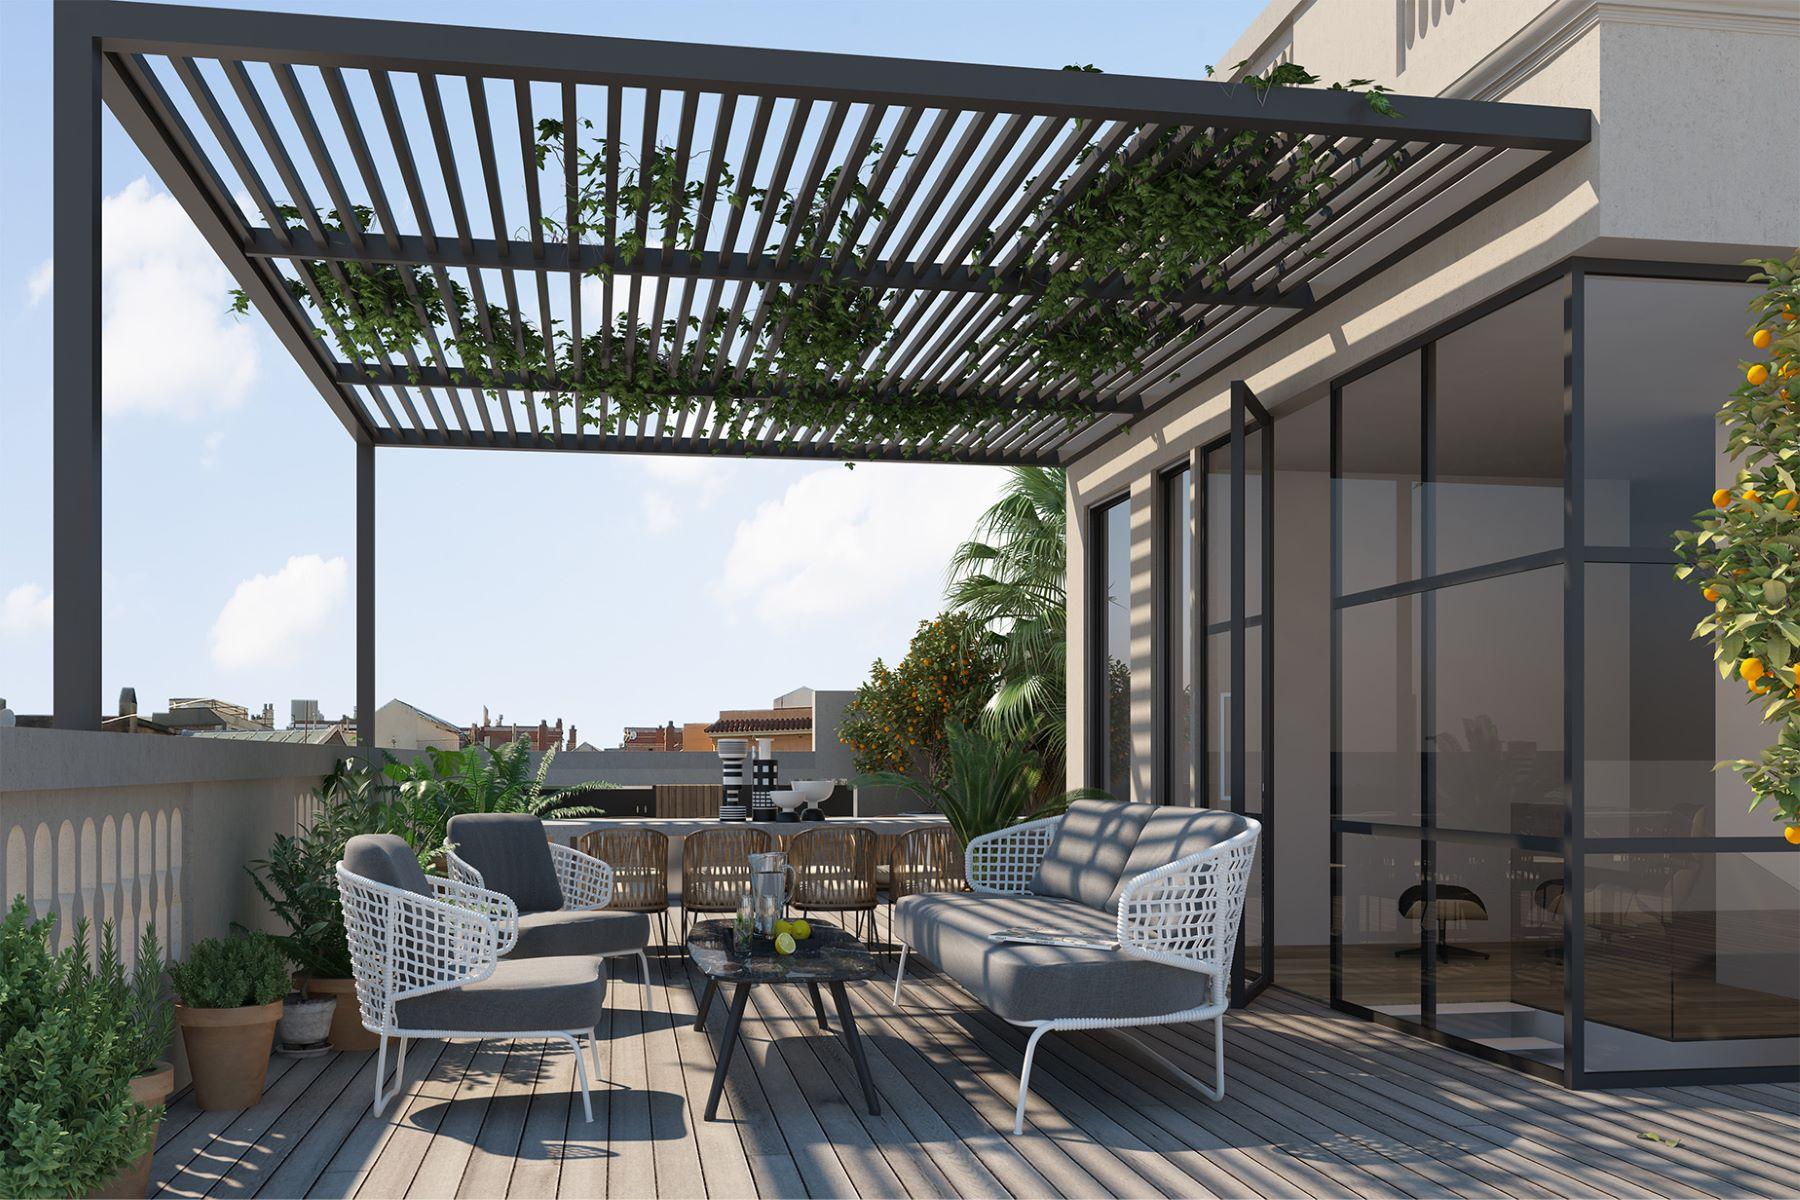 Apartment for Sale at Excellent duplex penthouse in Gràcia Barcelona City, Barcelona, 08012 Spain